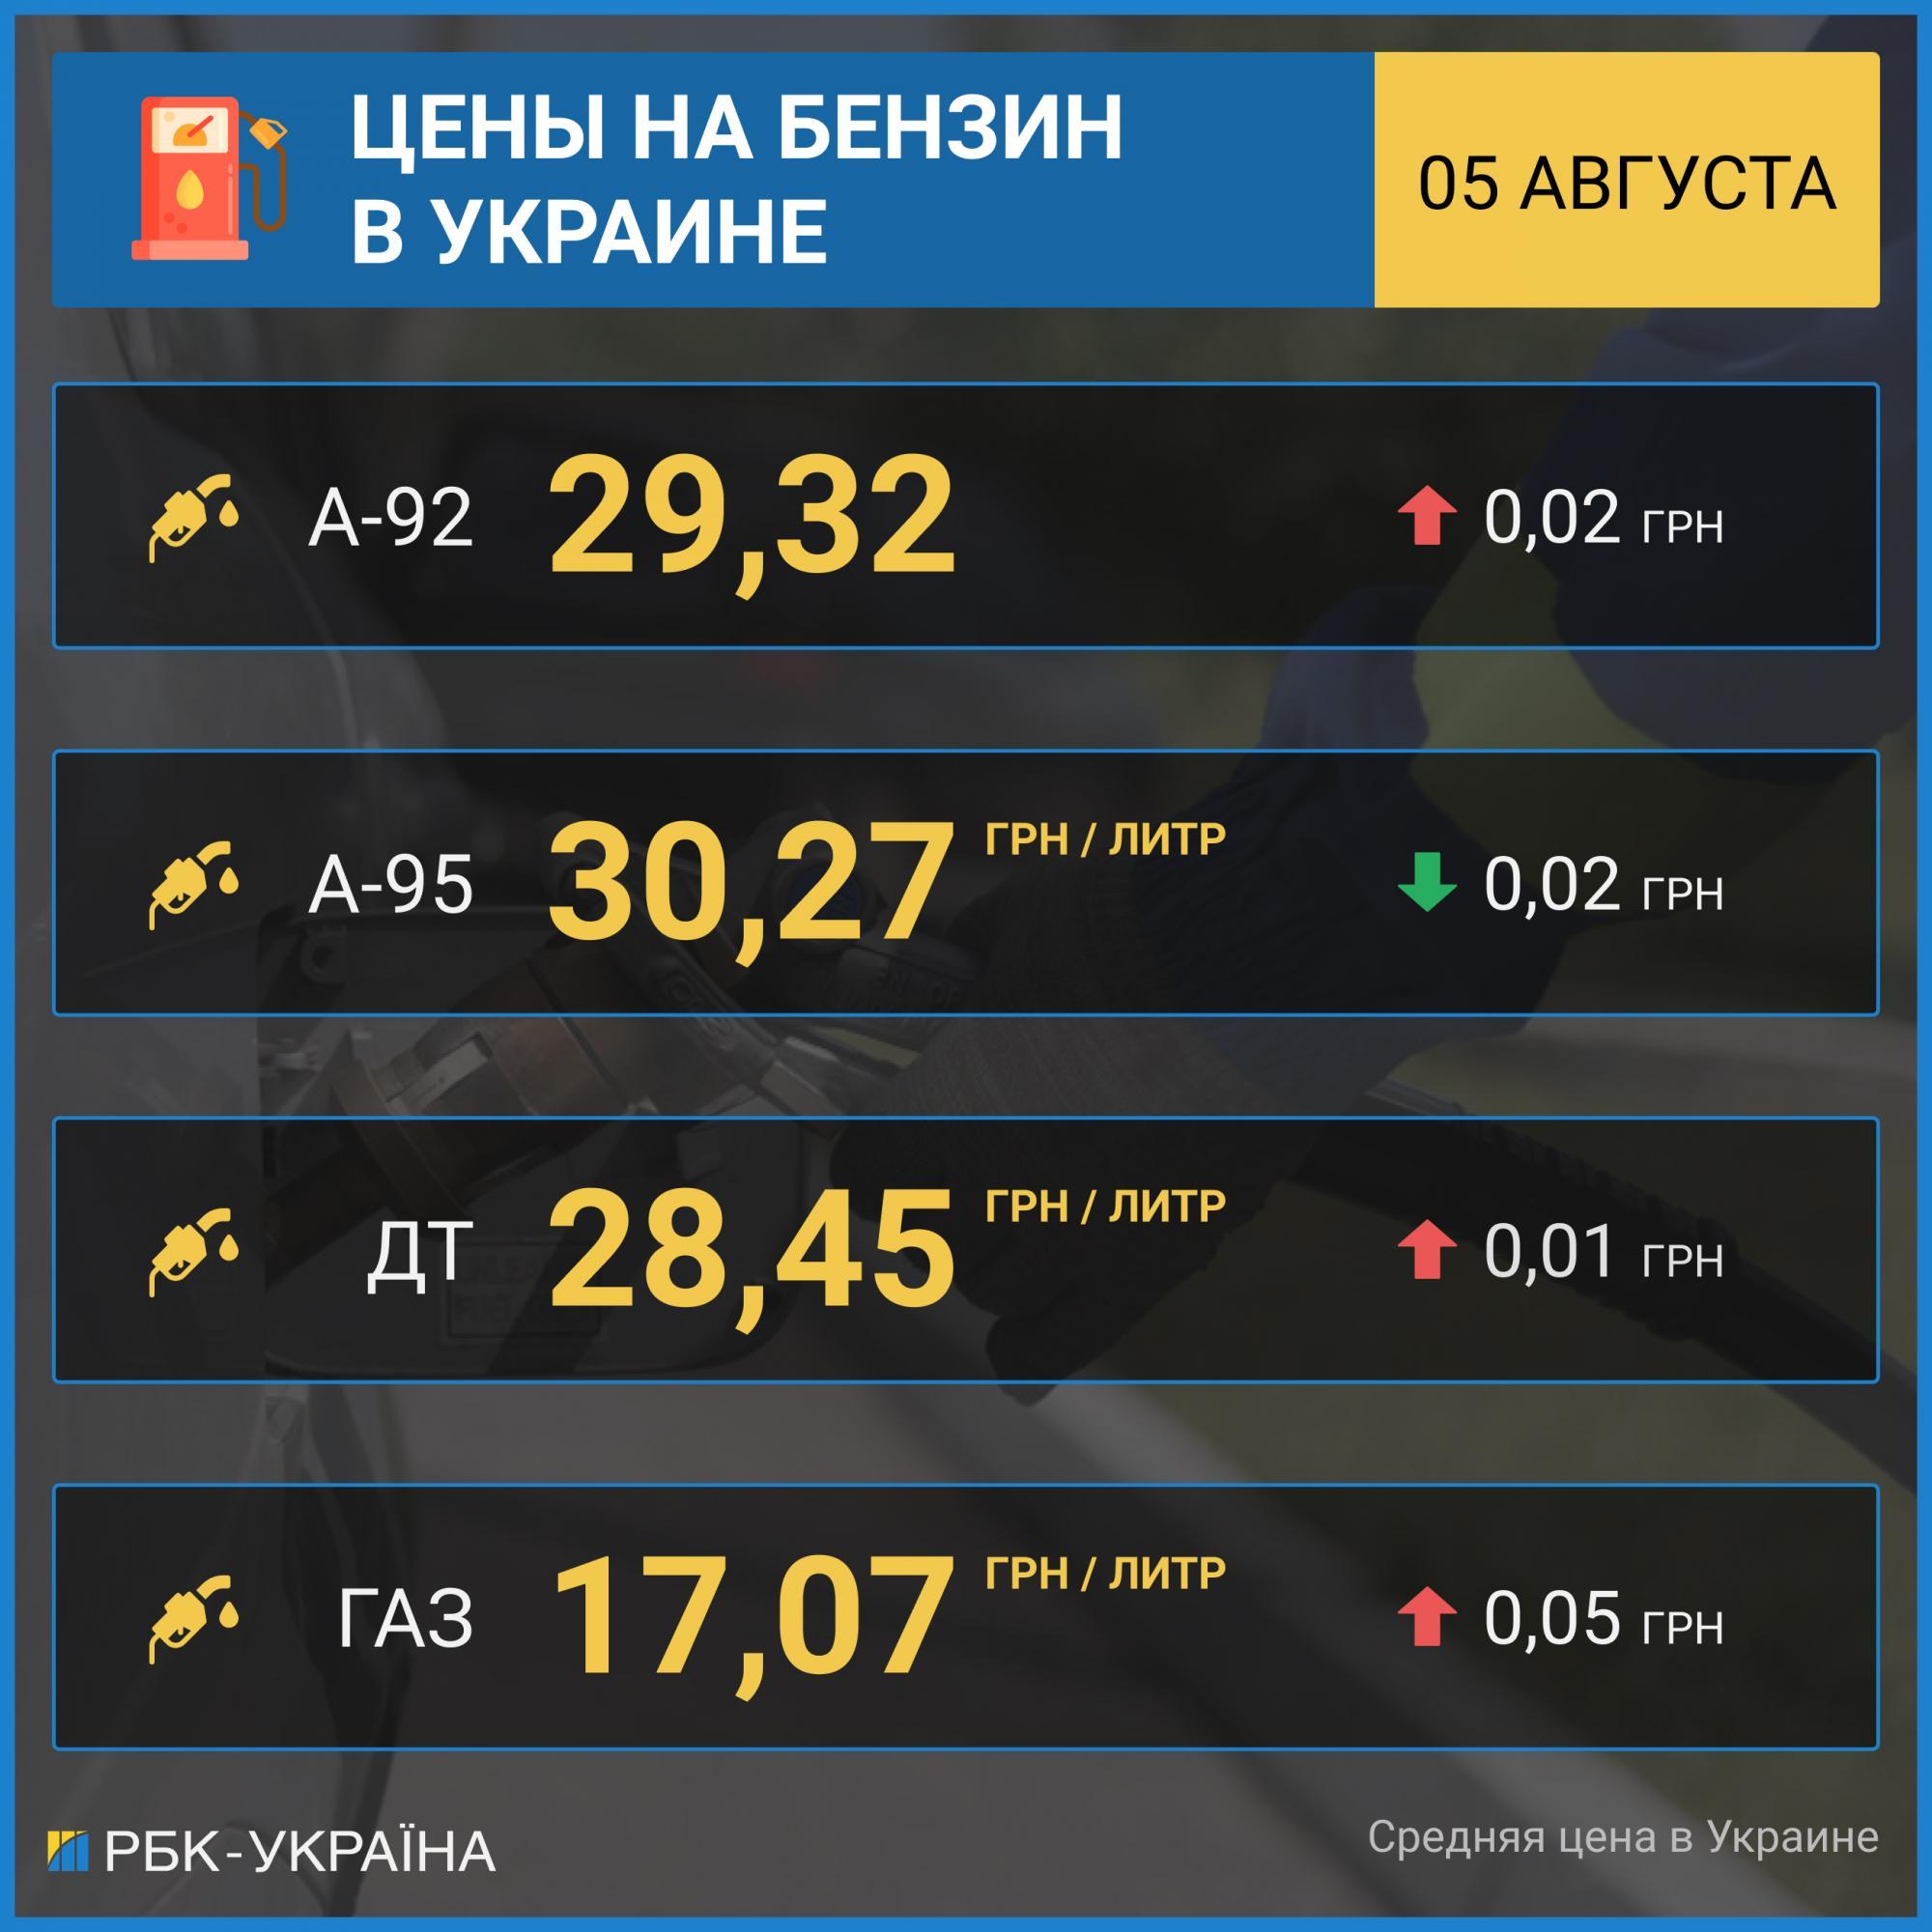 Рост цен на бензин приостановился, автогаз подорожал еще на 5 копеек